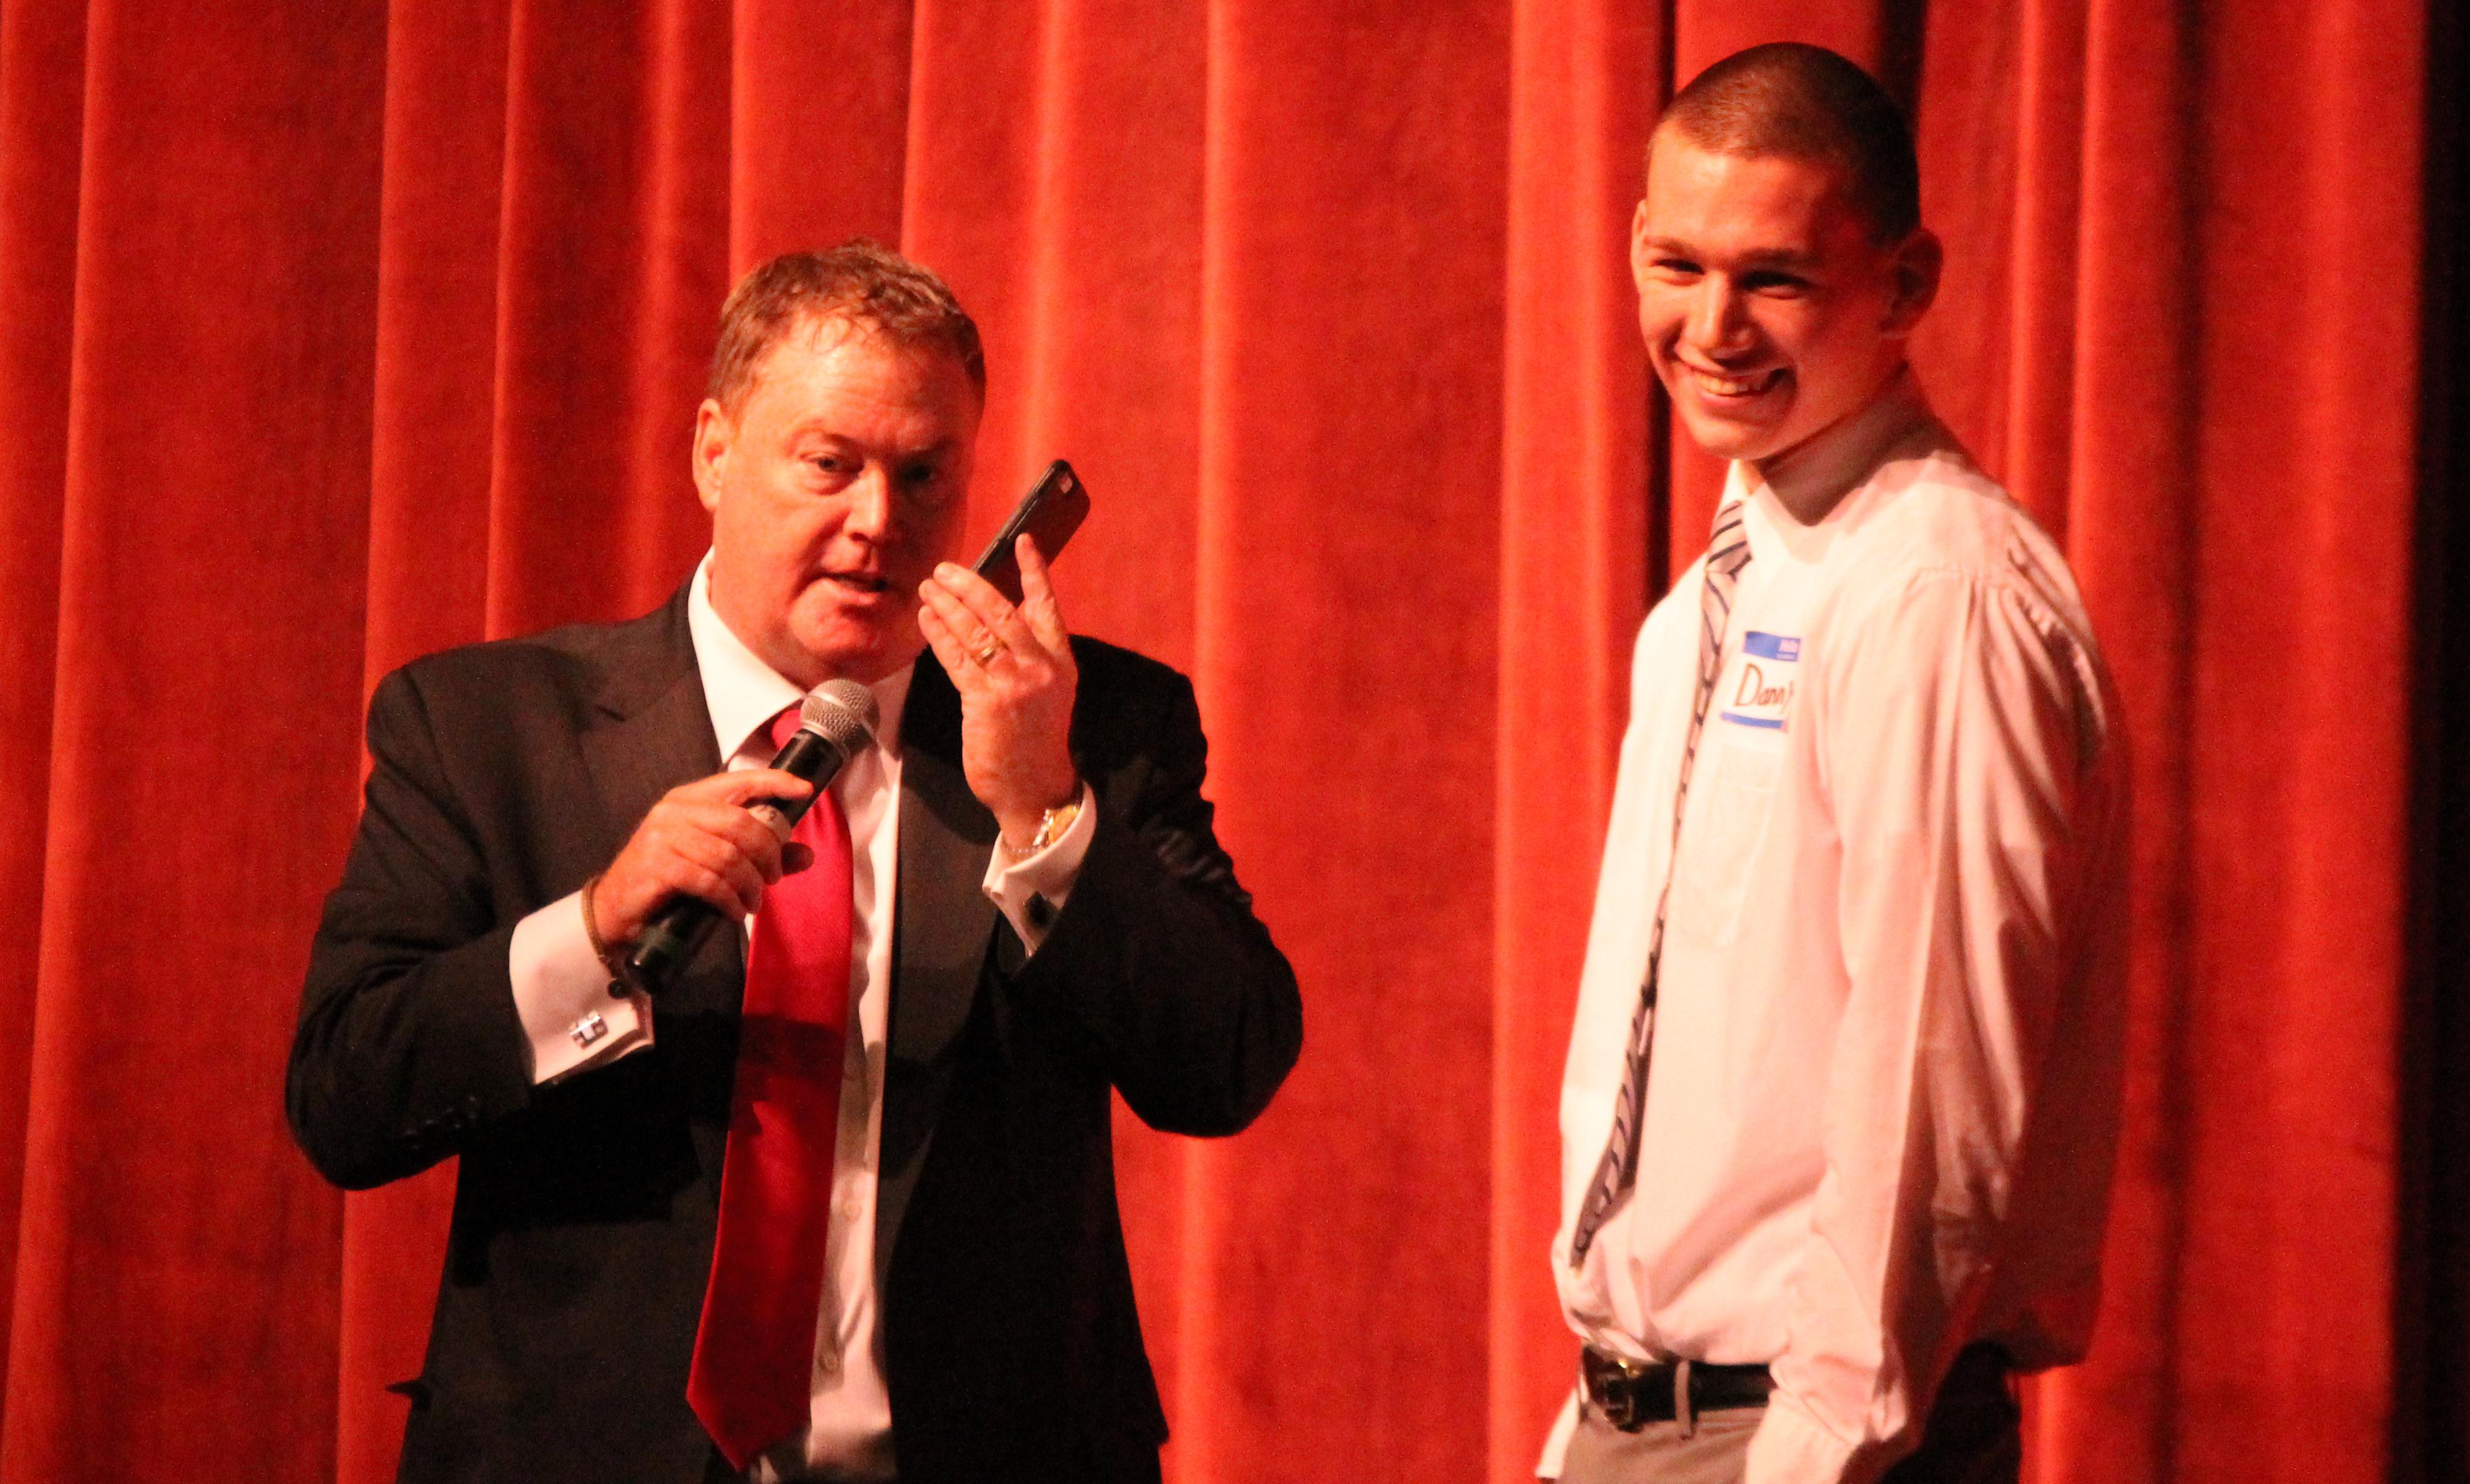 Motivational speaker Ed Gerety talks on Taunton's Danny Keogh's phone during his presentation on Wednesday. (Ryan Lanigan/HockomockSports.com)